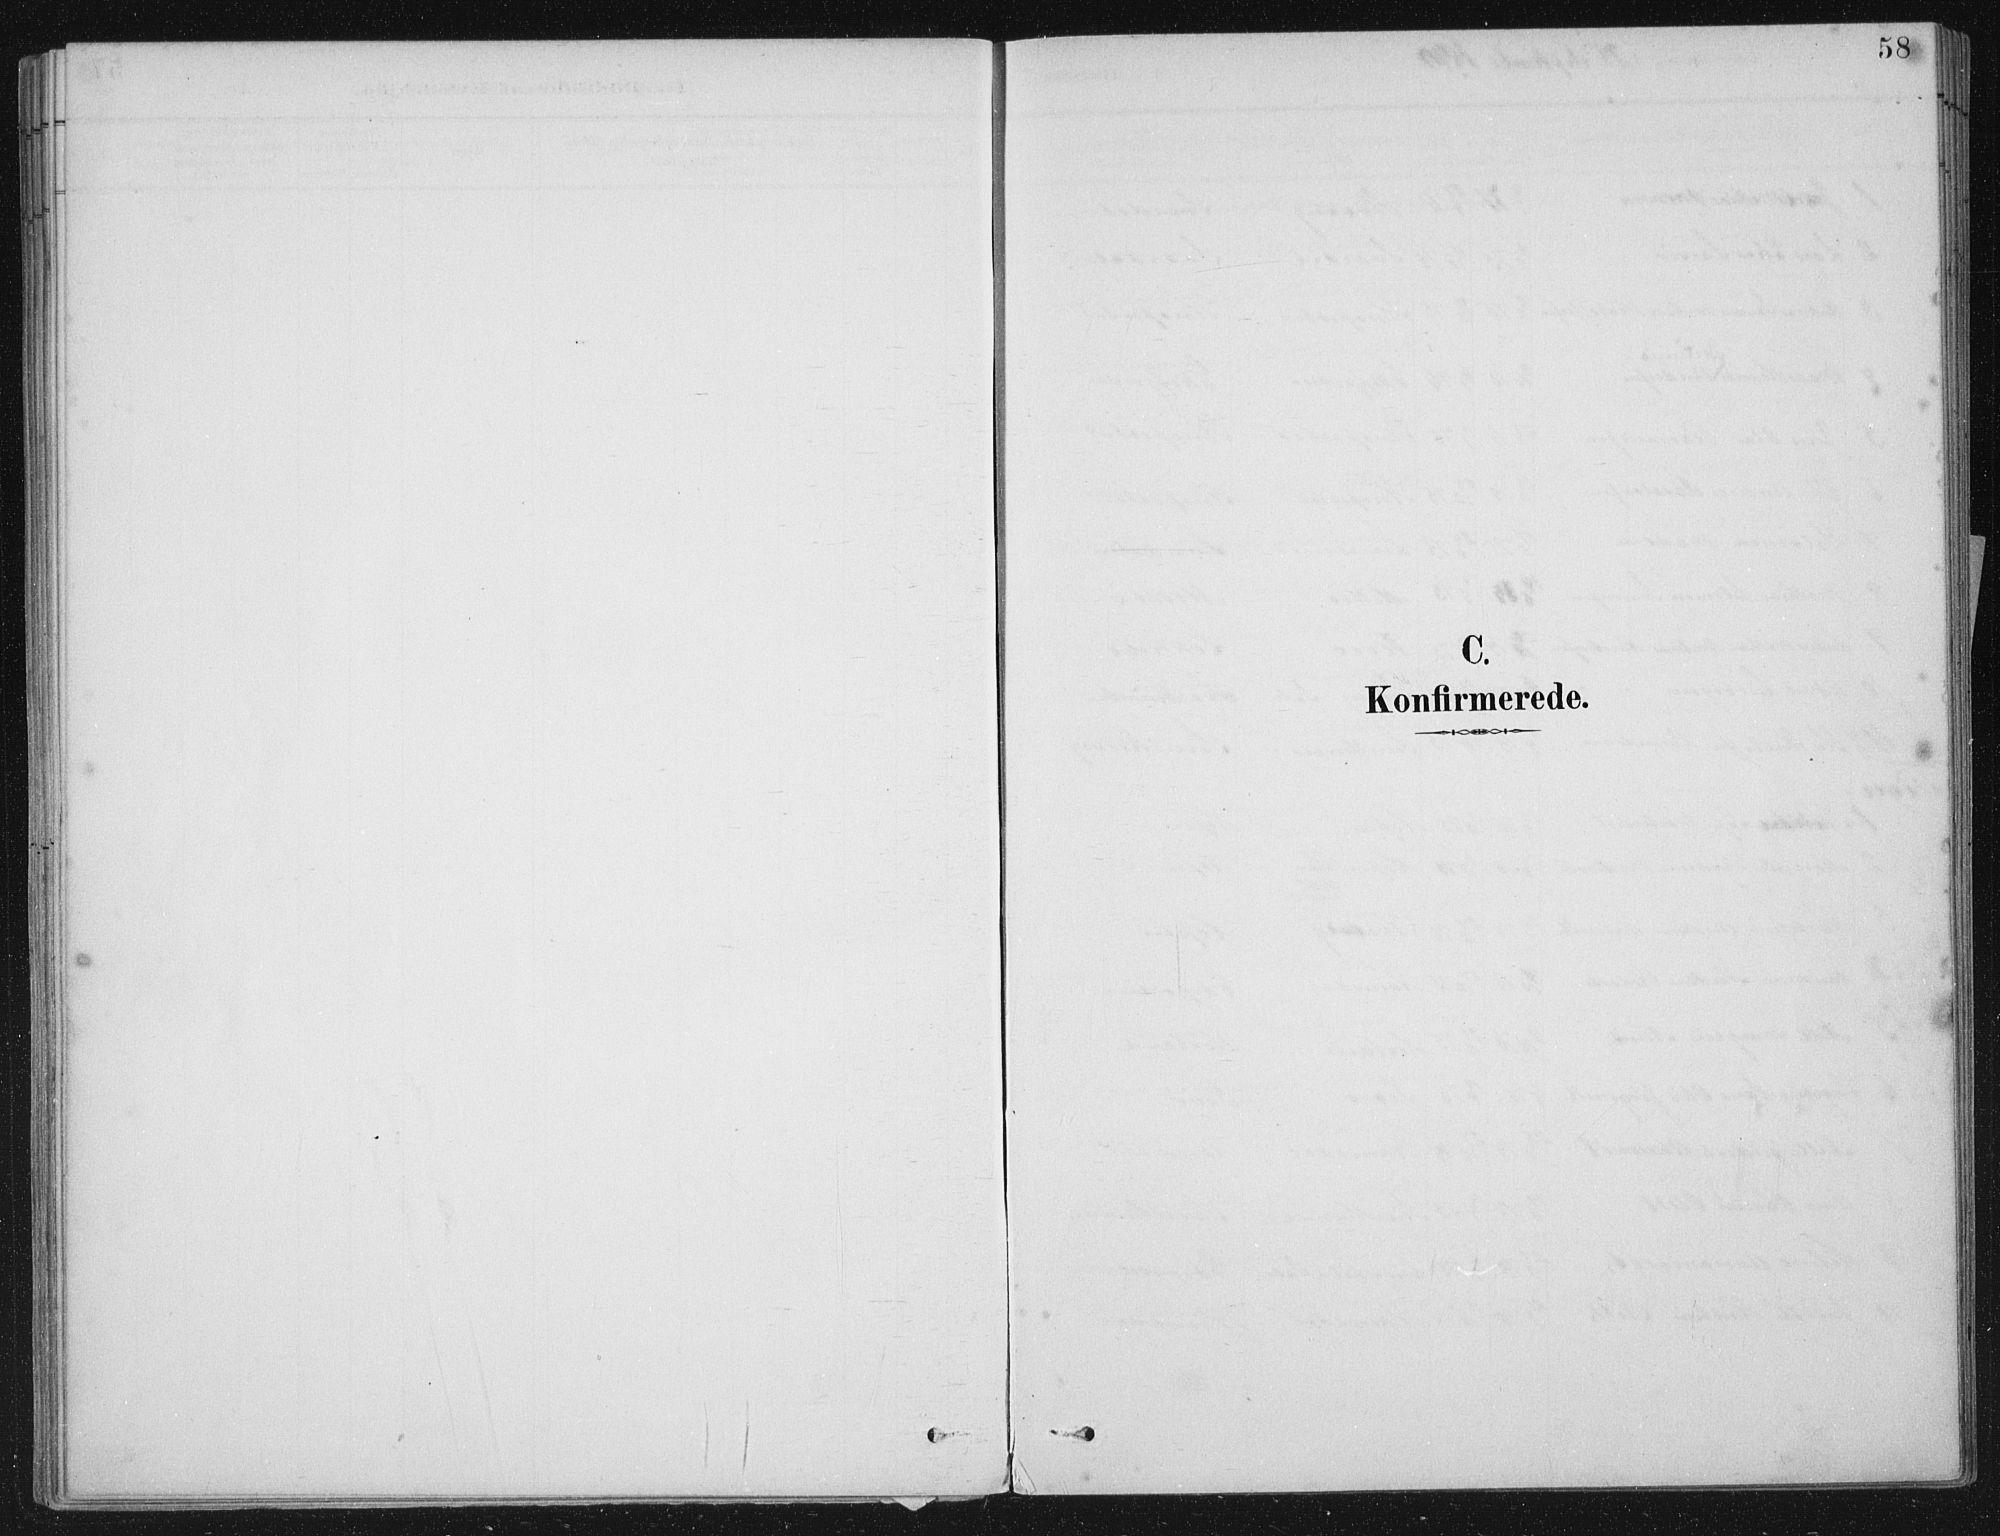 SAB, Kinn sokneprestembete, H/Haa/Haae/L0001: Parish register (official) no. E 1, 1890-1916, p. 58